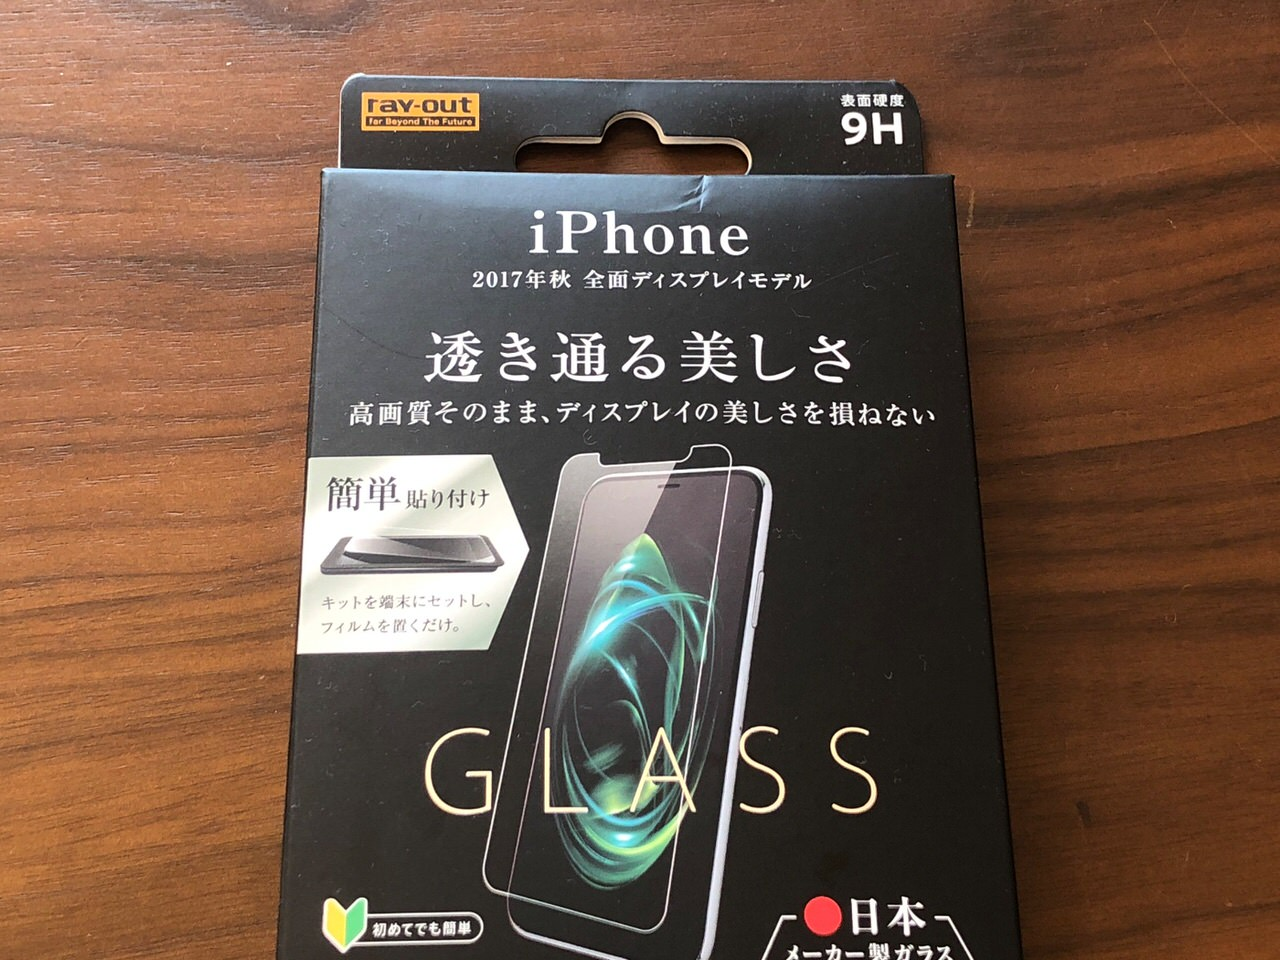 Iphone x firstimpresion 0600